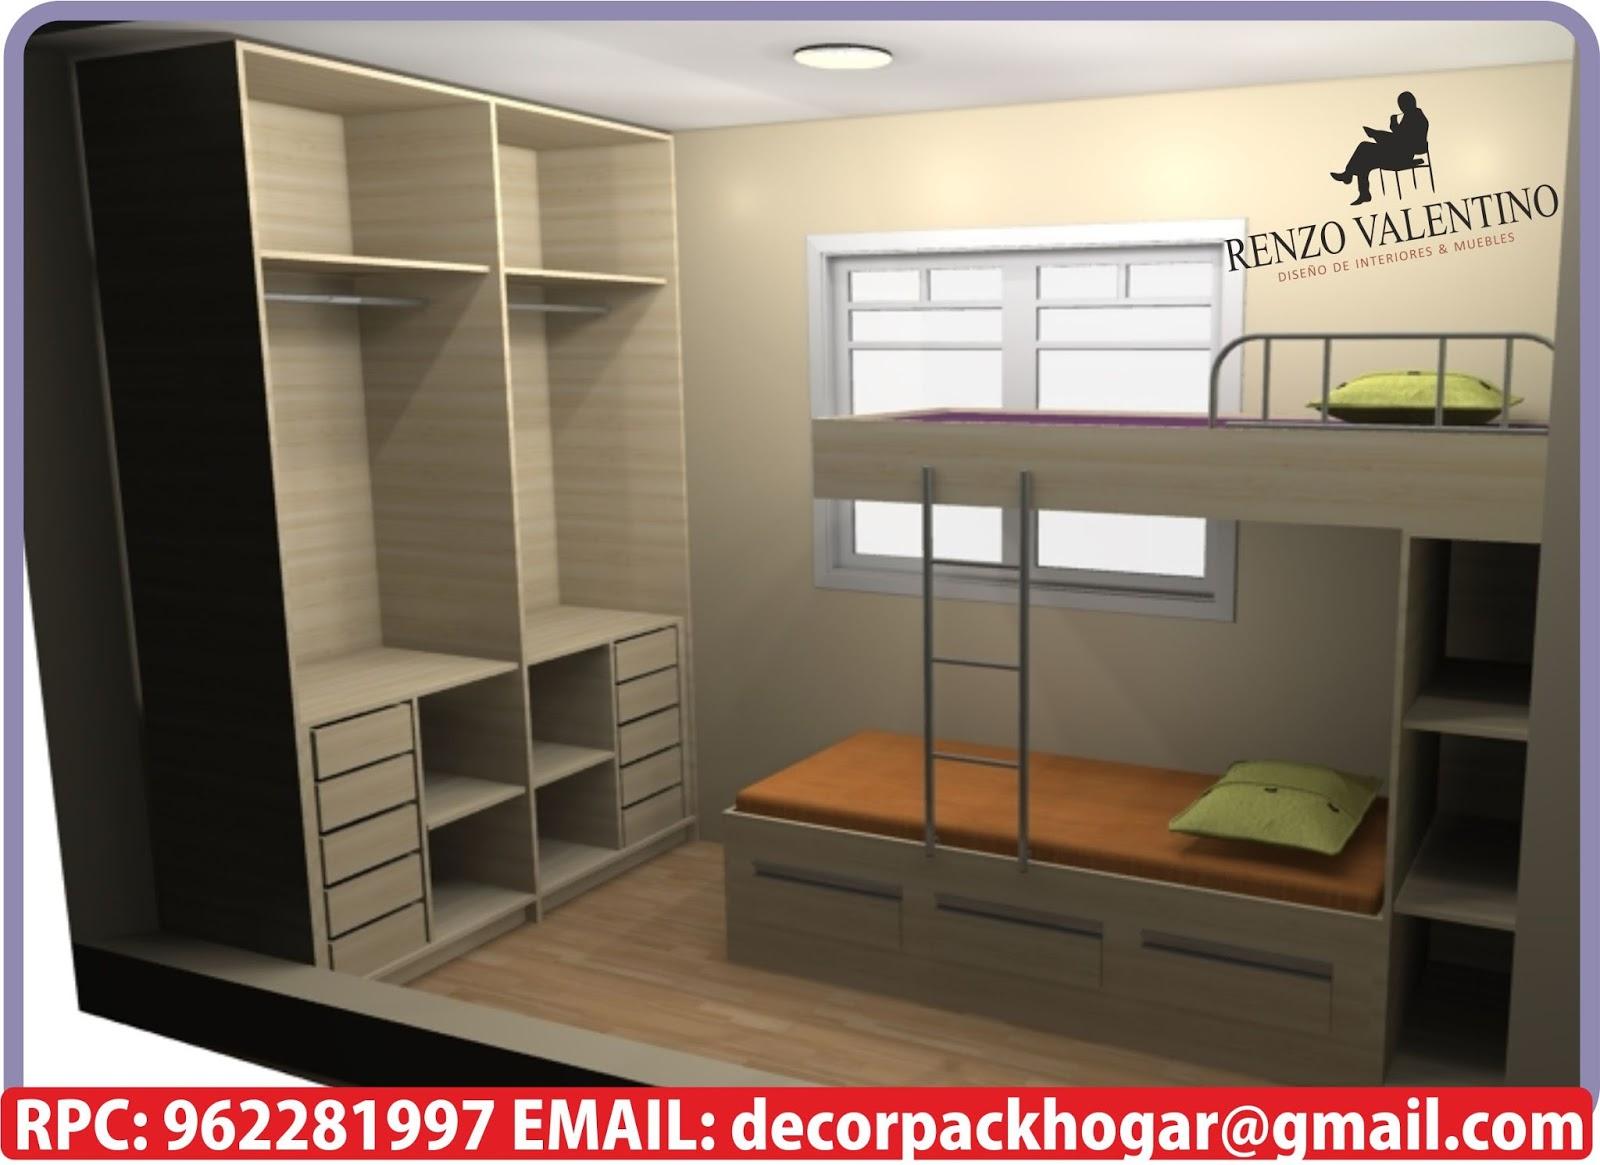 Dise os fabricacion de closet cocina y muebles de oficina for Modelos de muebles de melamina